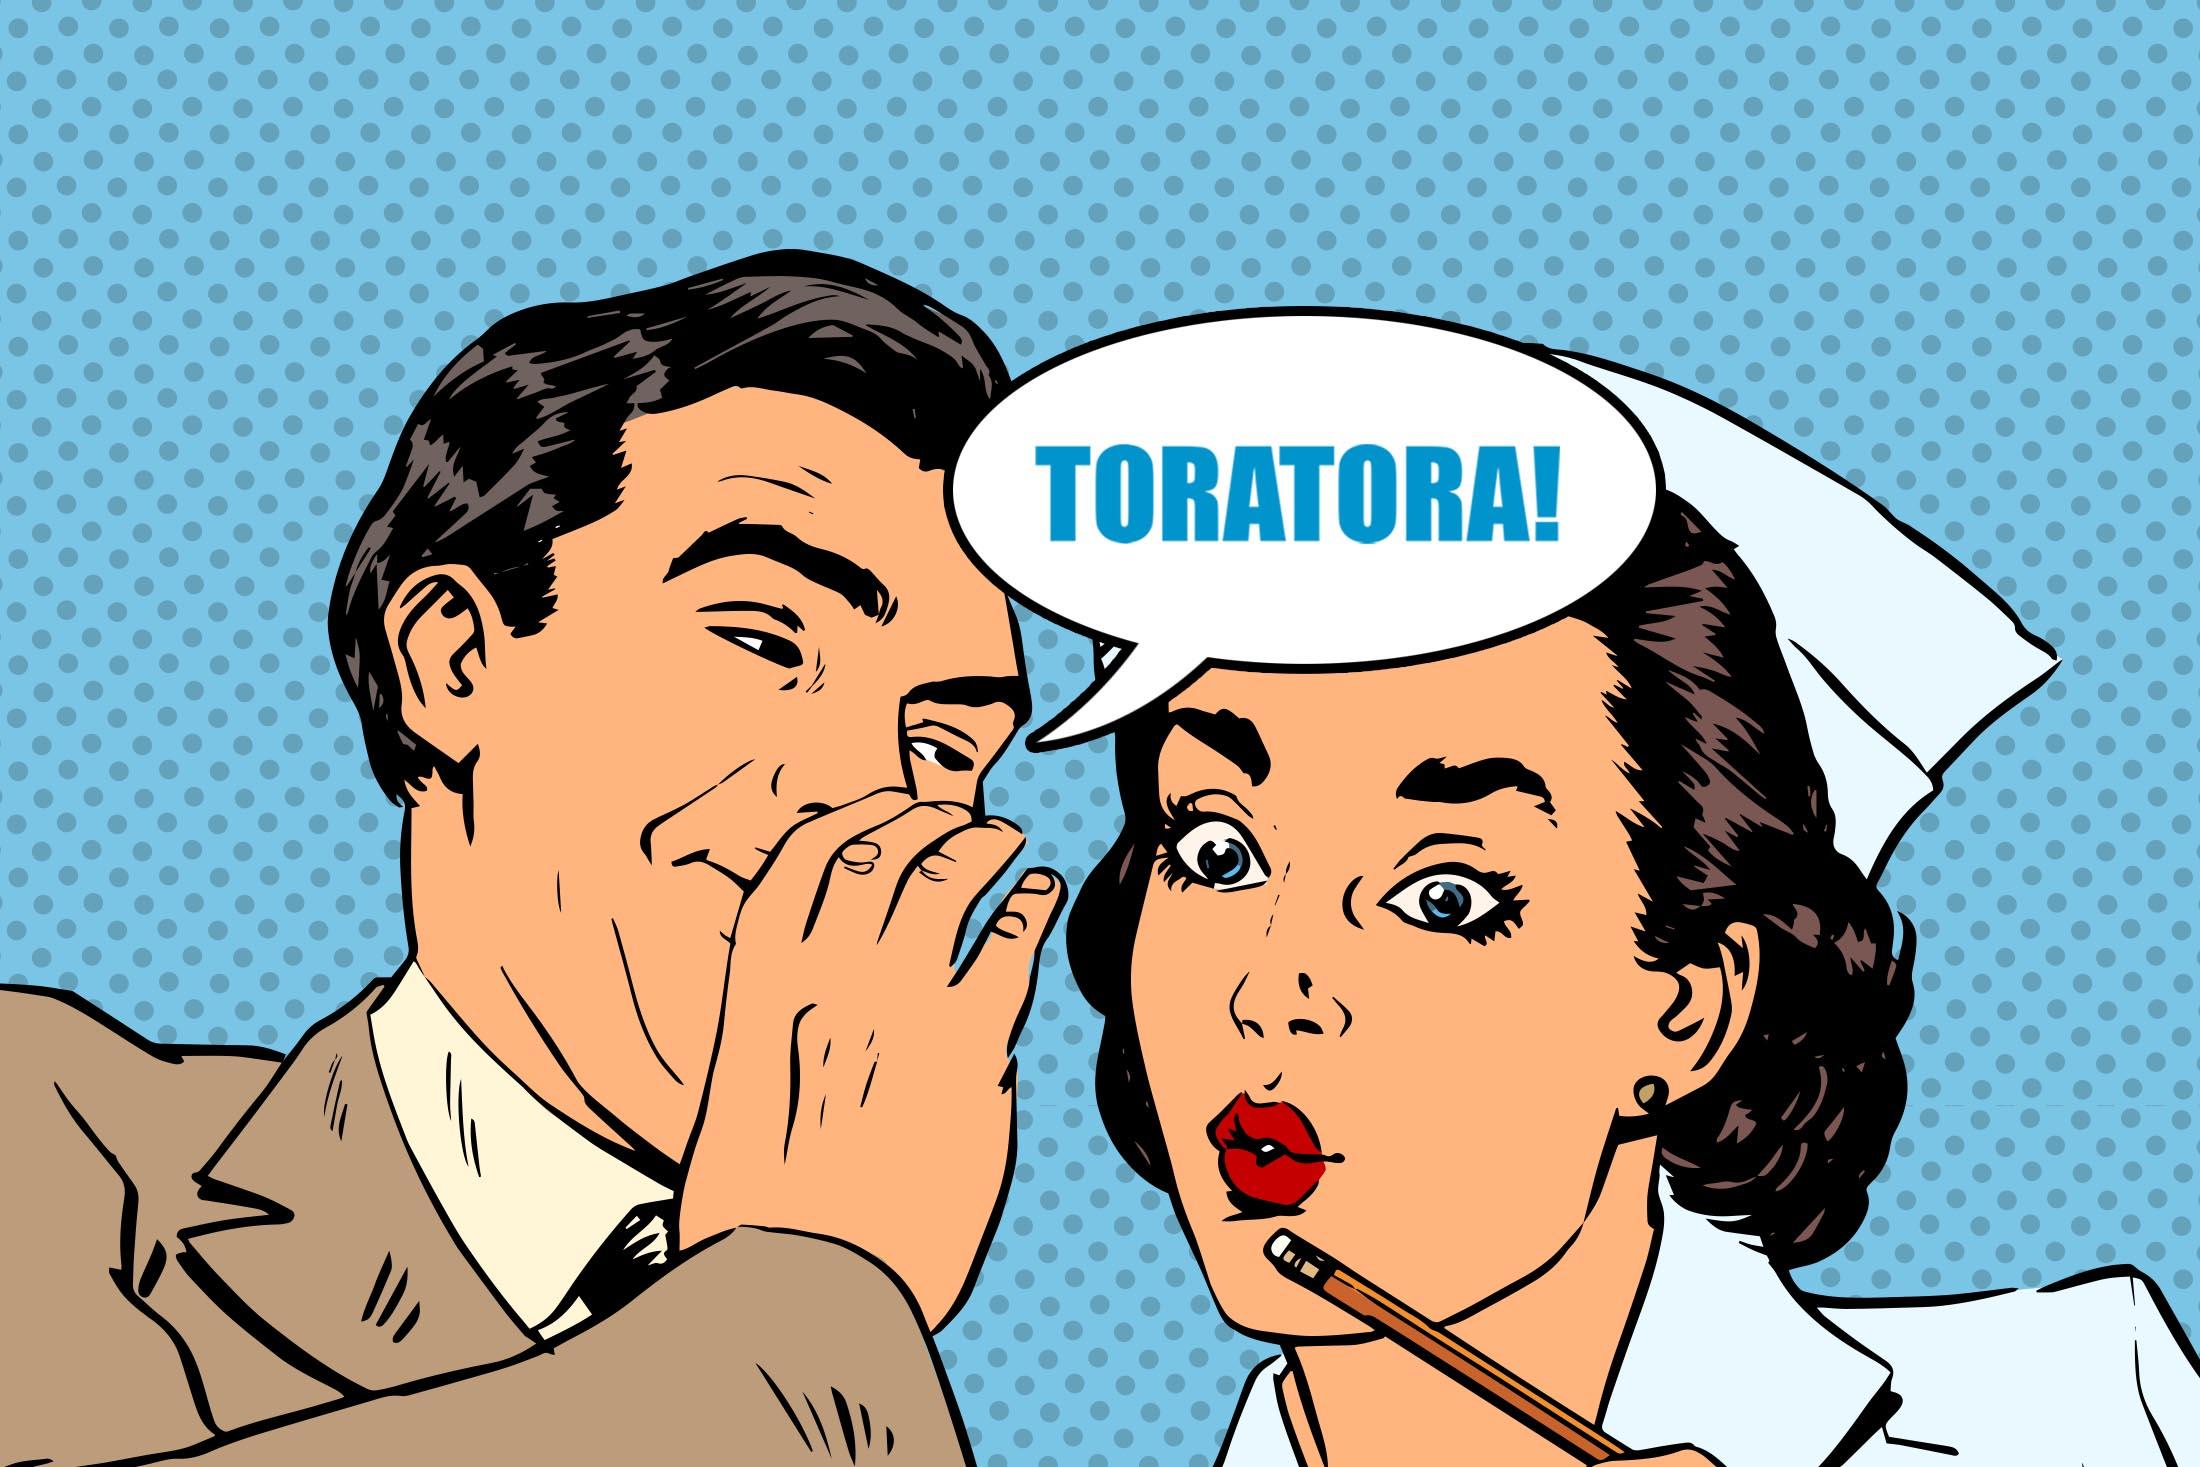 "<a href=""http://www.toratora.gr/"" target=""_blank"">Toratora.gr</a>"